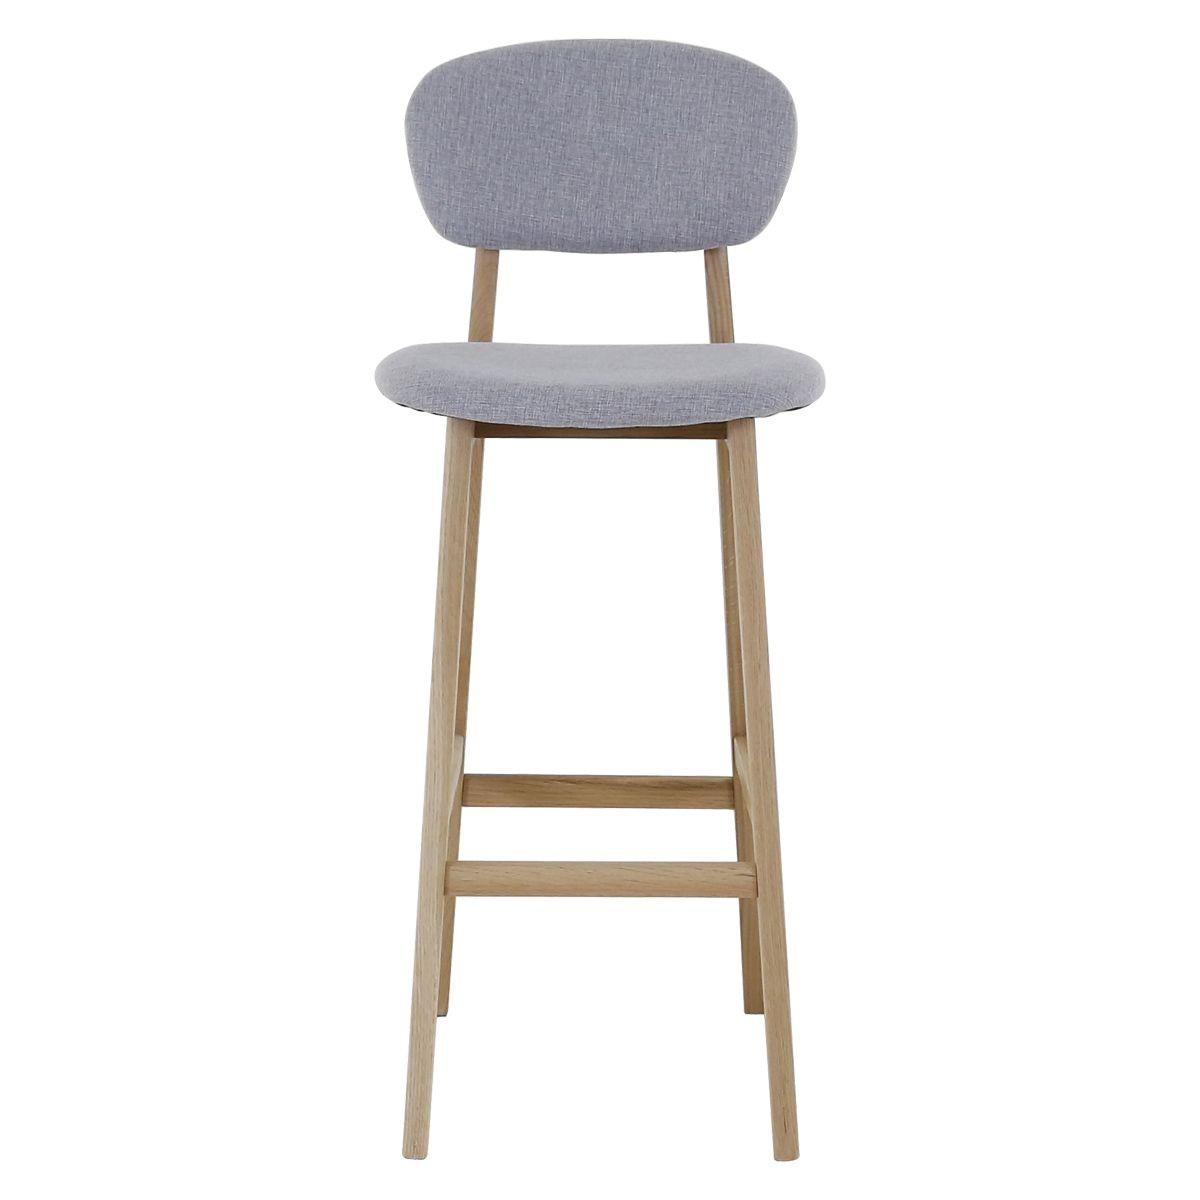 Chaise De Bar Tissu Et Chene Hana X2 Taille Tu Chaise Bar Tabouret Design Et Chaise